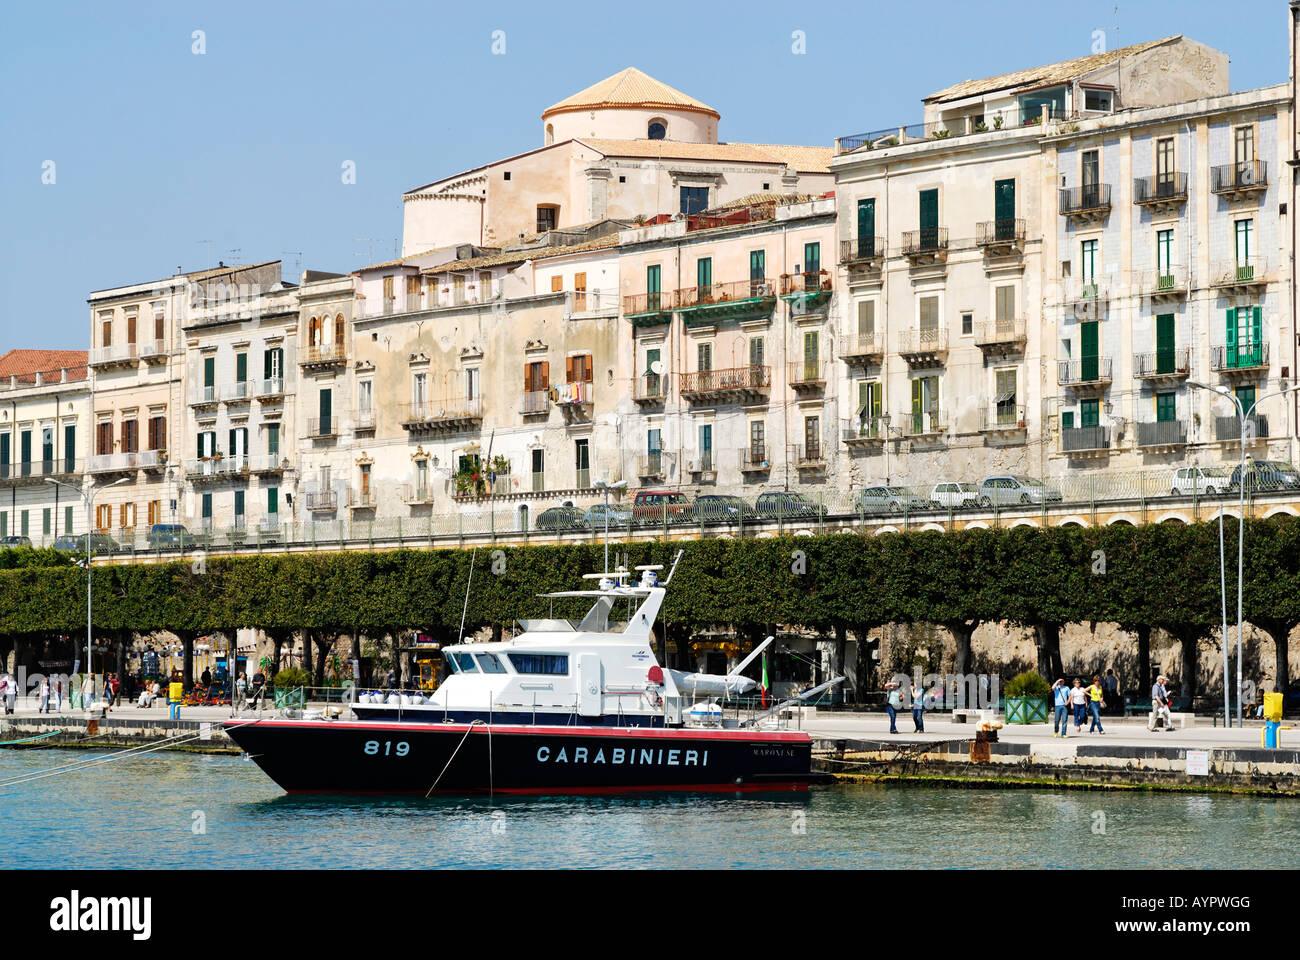 Carabinieri (Italian gendarmerie) boat in the harbour of Syracuse, Sicily, Italy - Stock Image